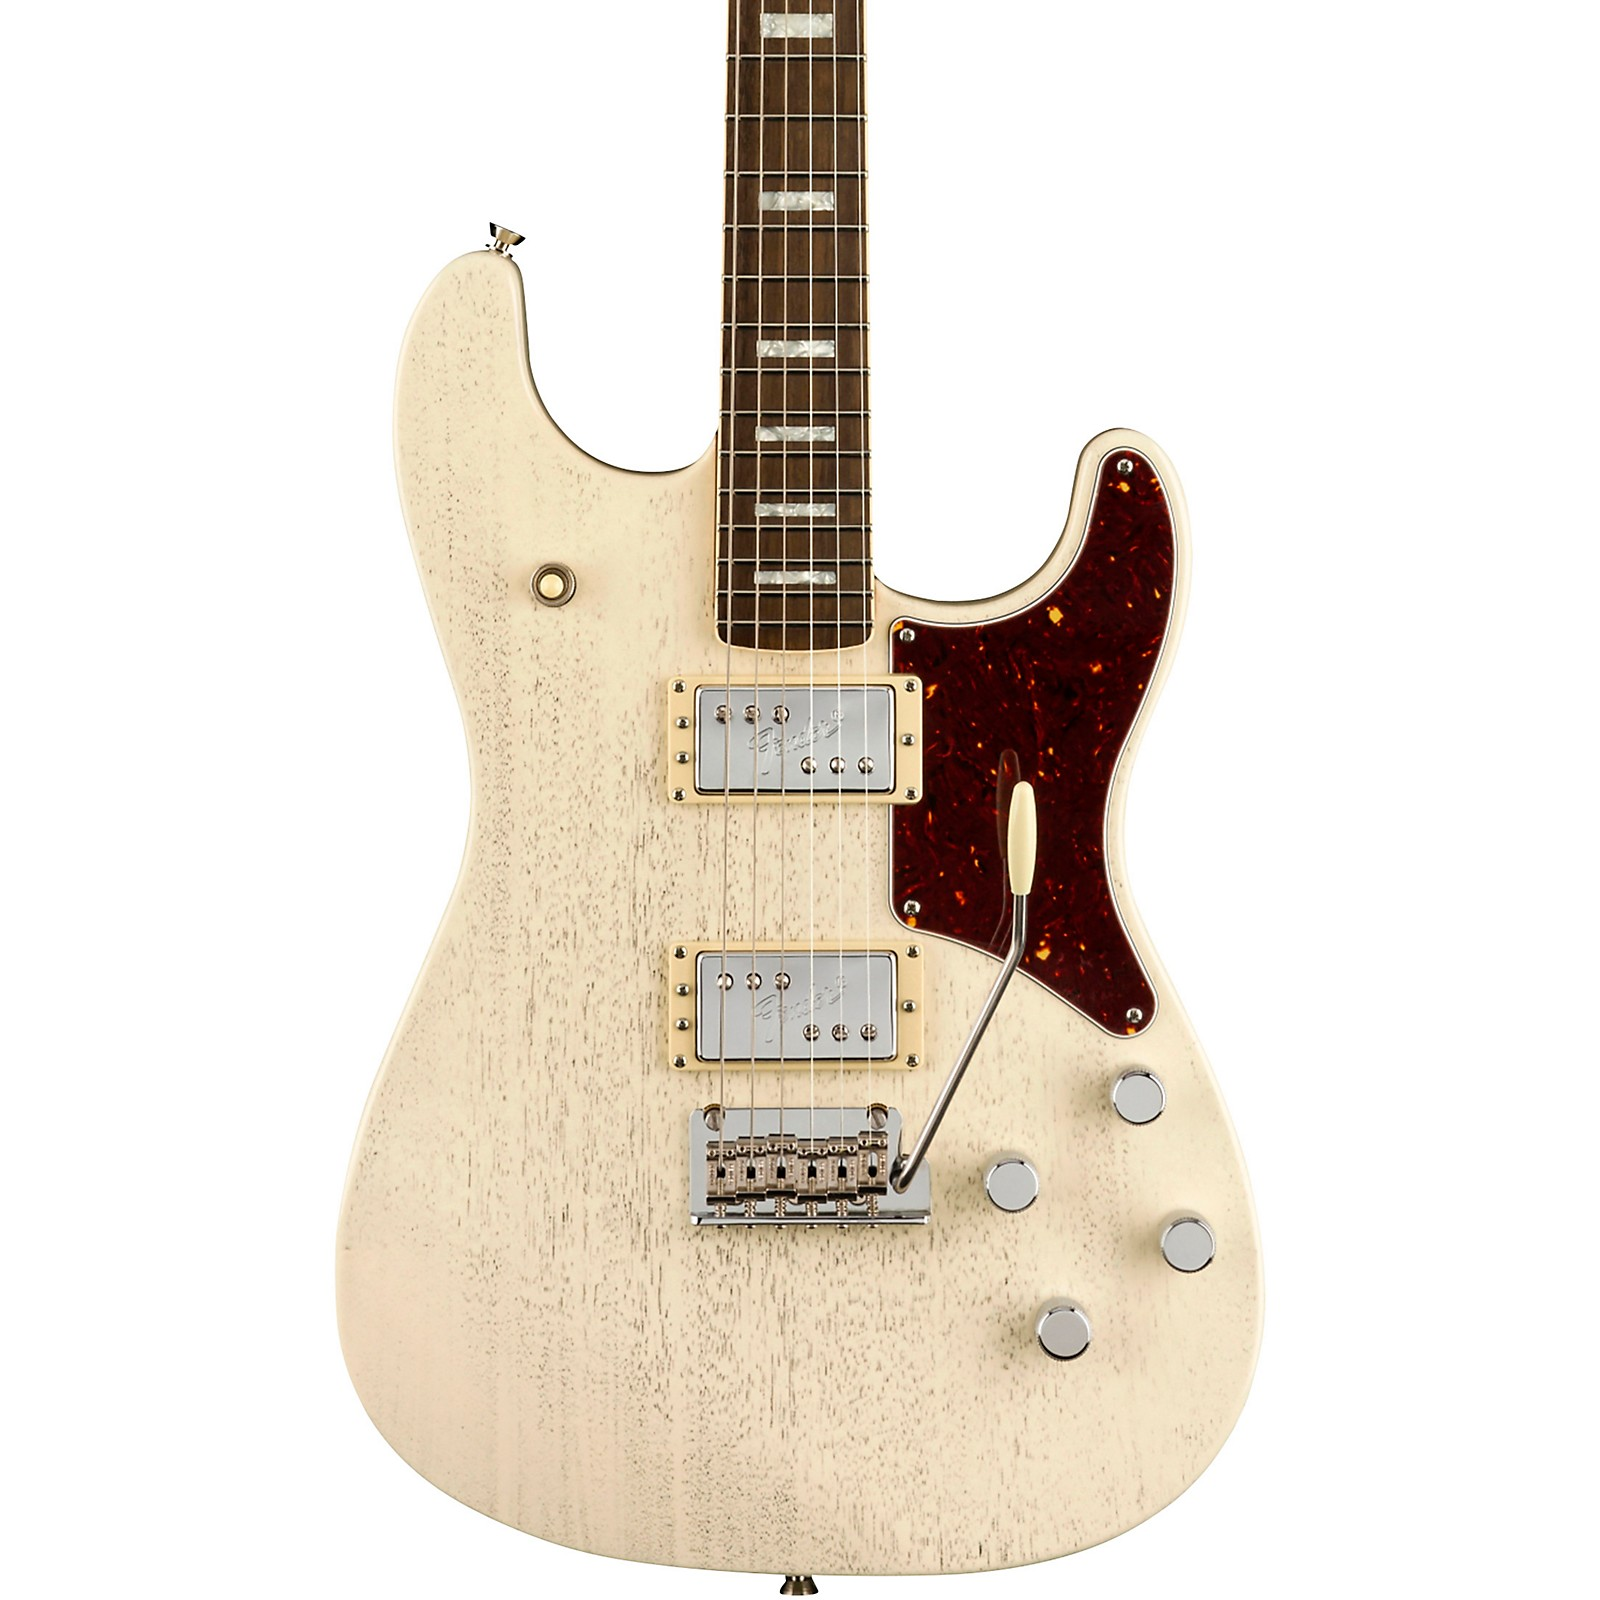 Fender Parallel Universe Vol. II Uptown Strat Mahogany Neck Electric Guitar